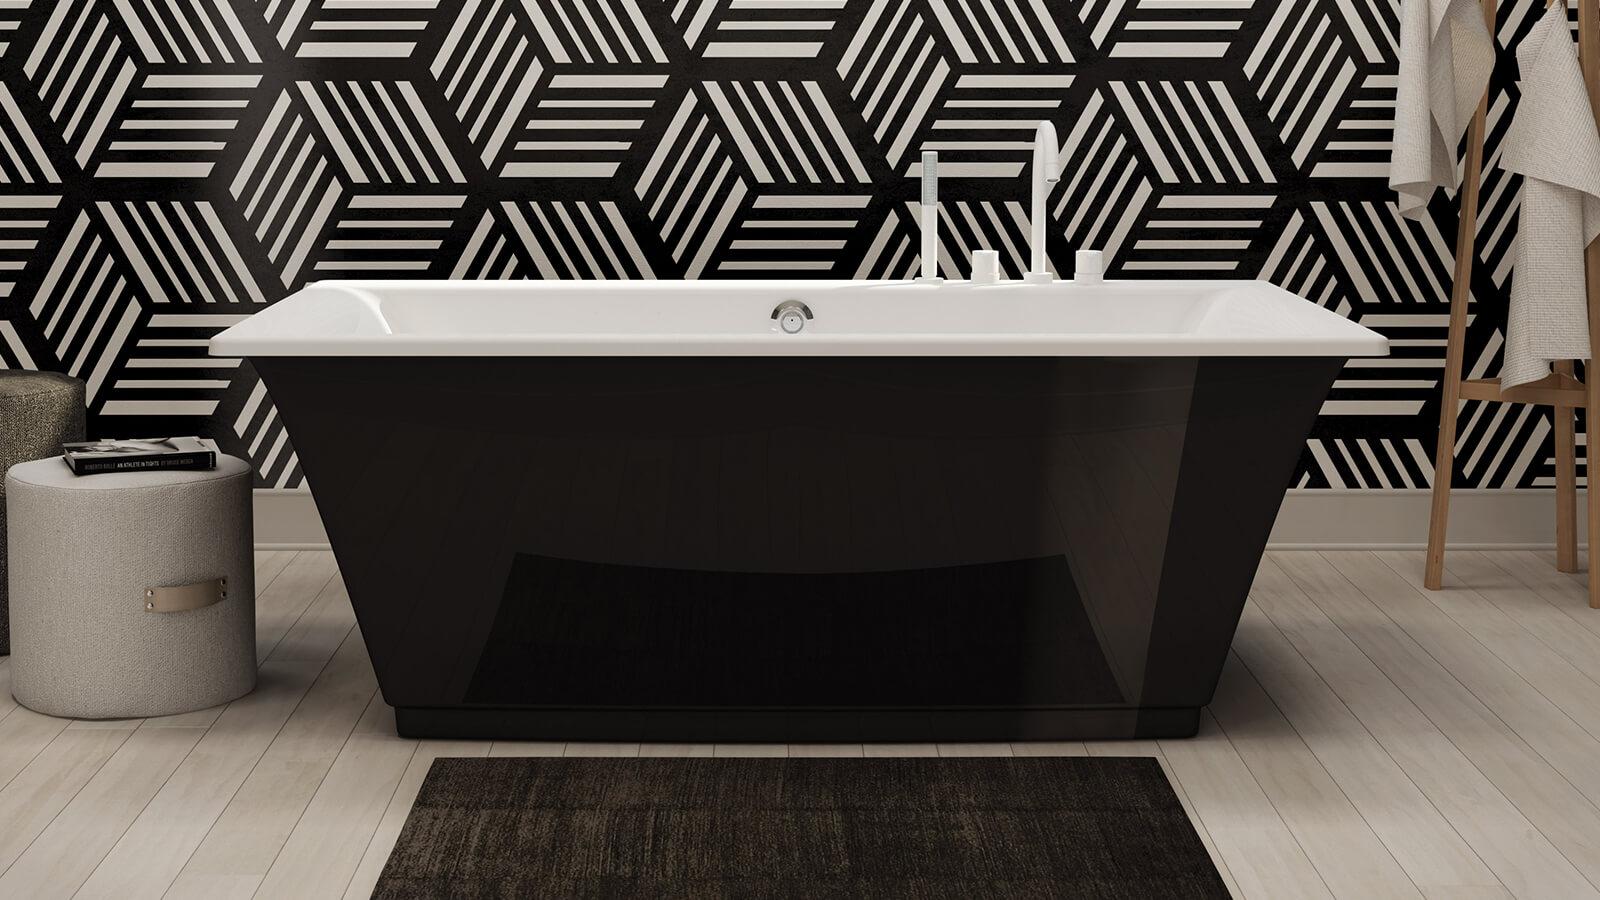 Optik F - Freestanding bathtub